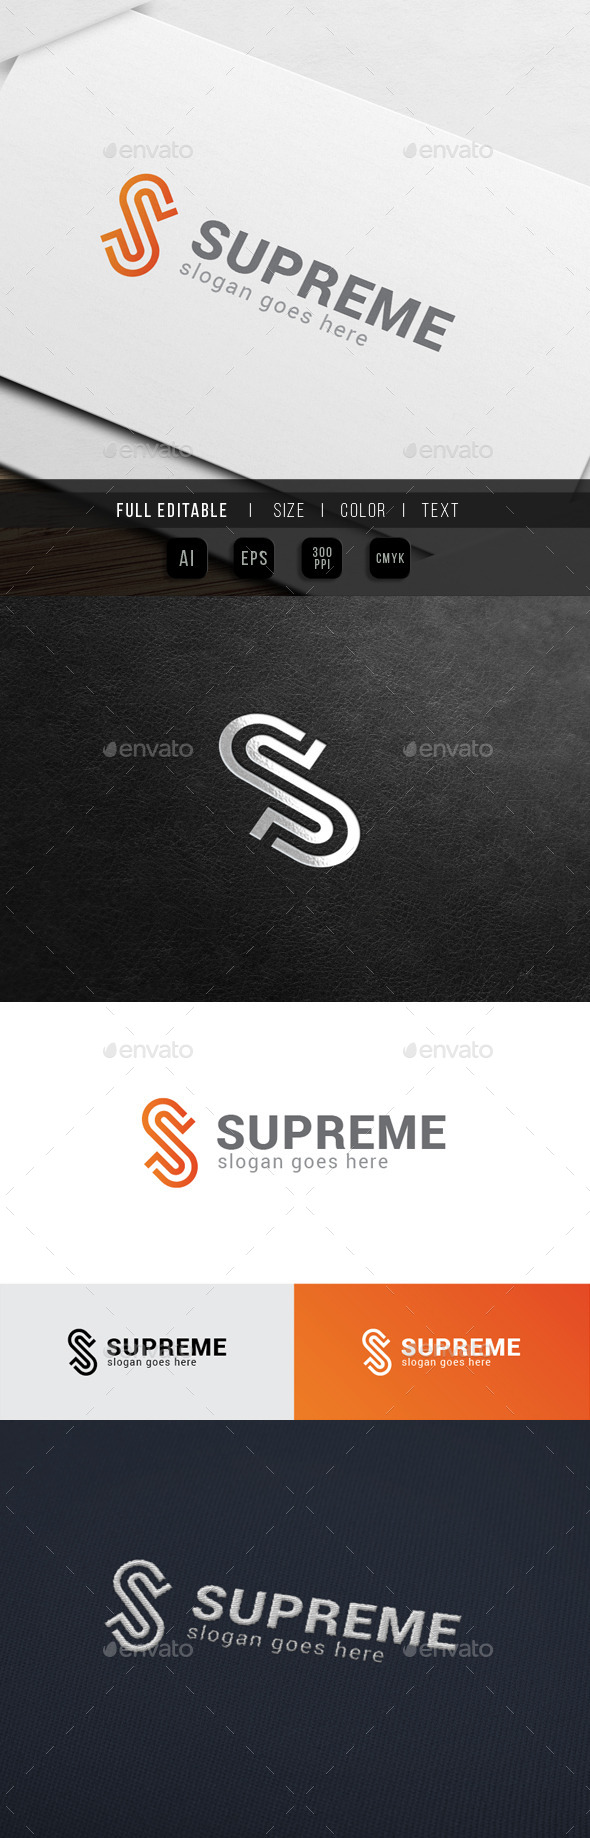 Super Supreme - Letter S - Letters Logo Templates